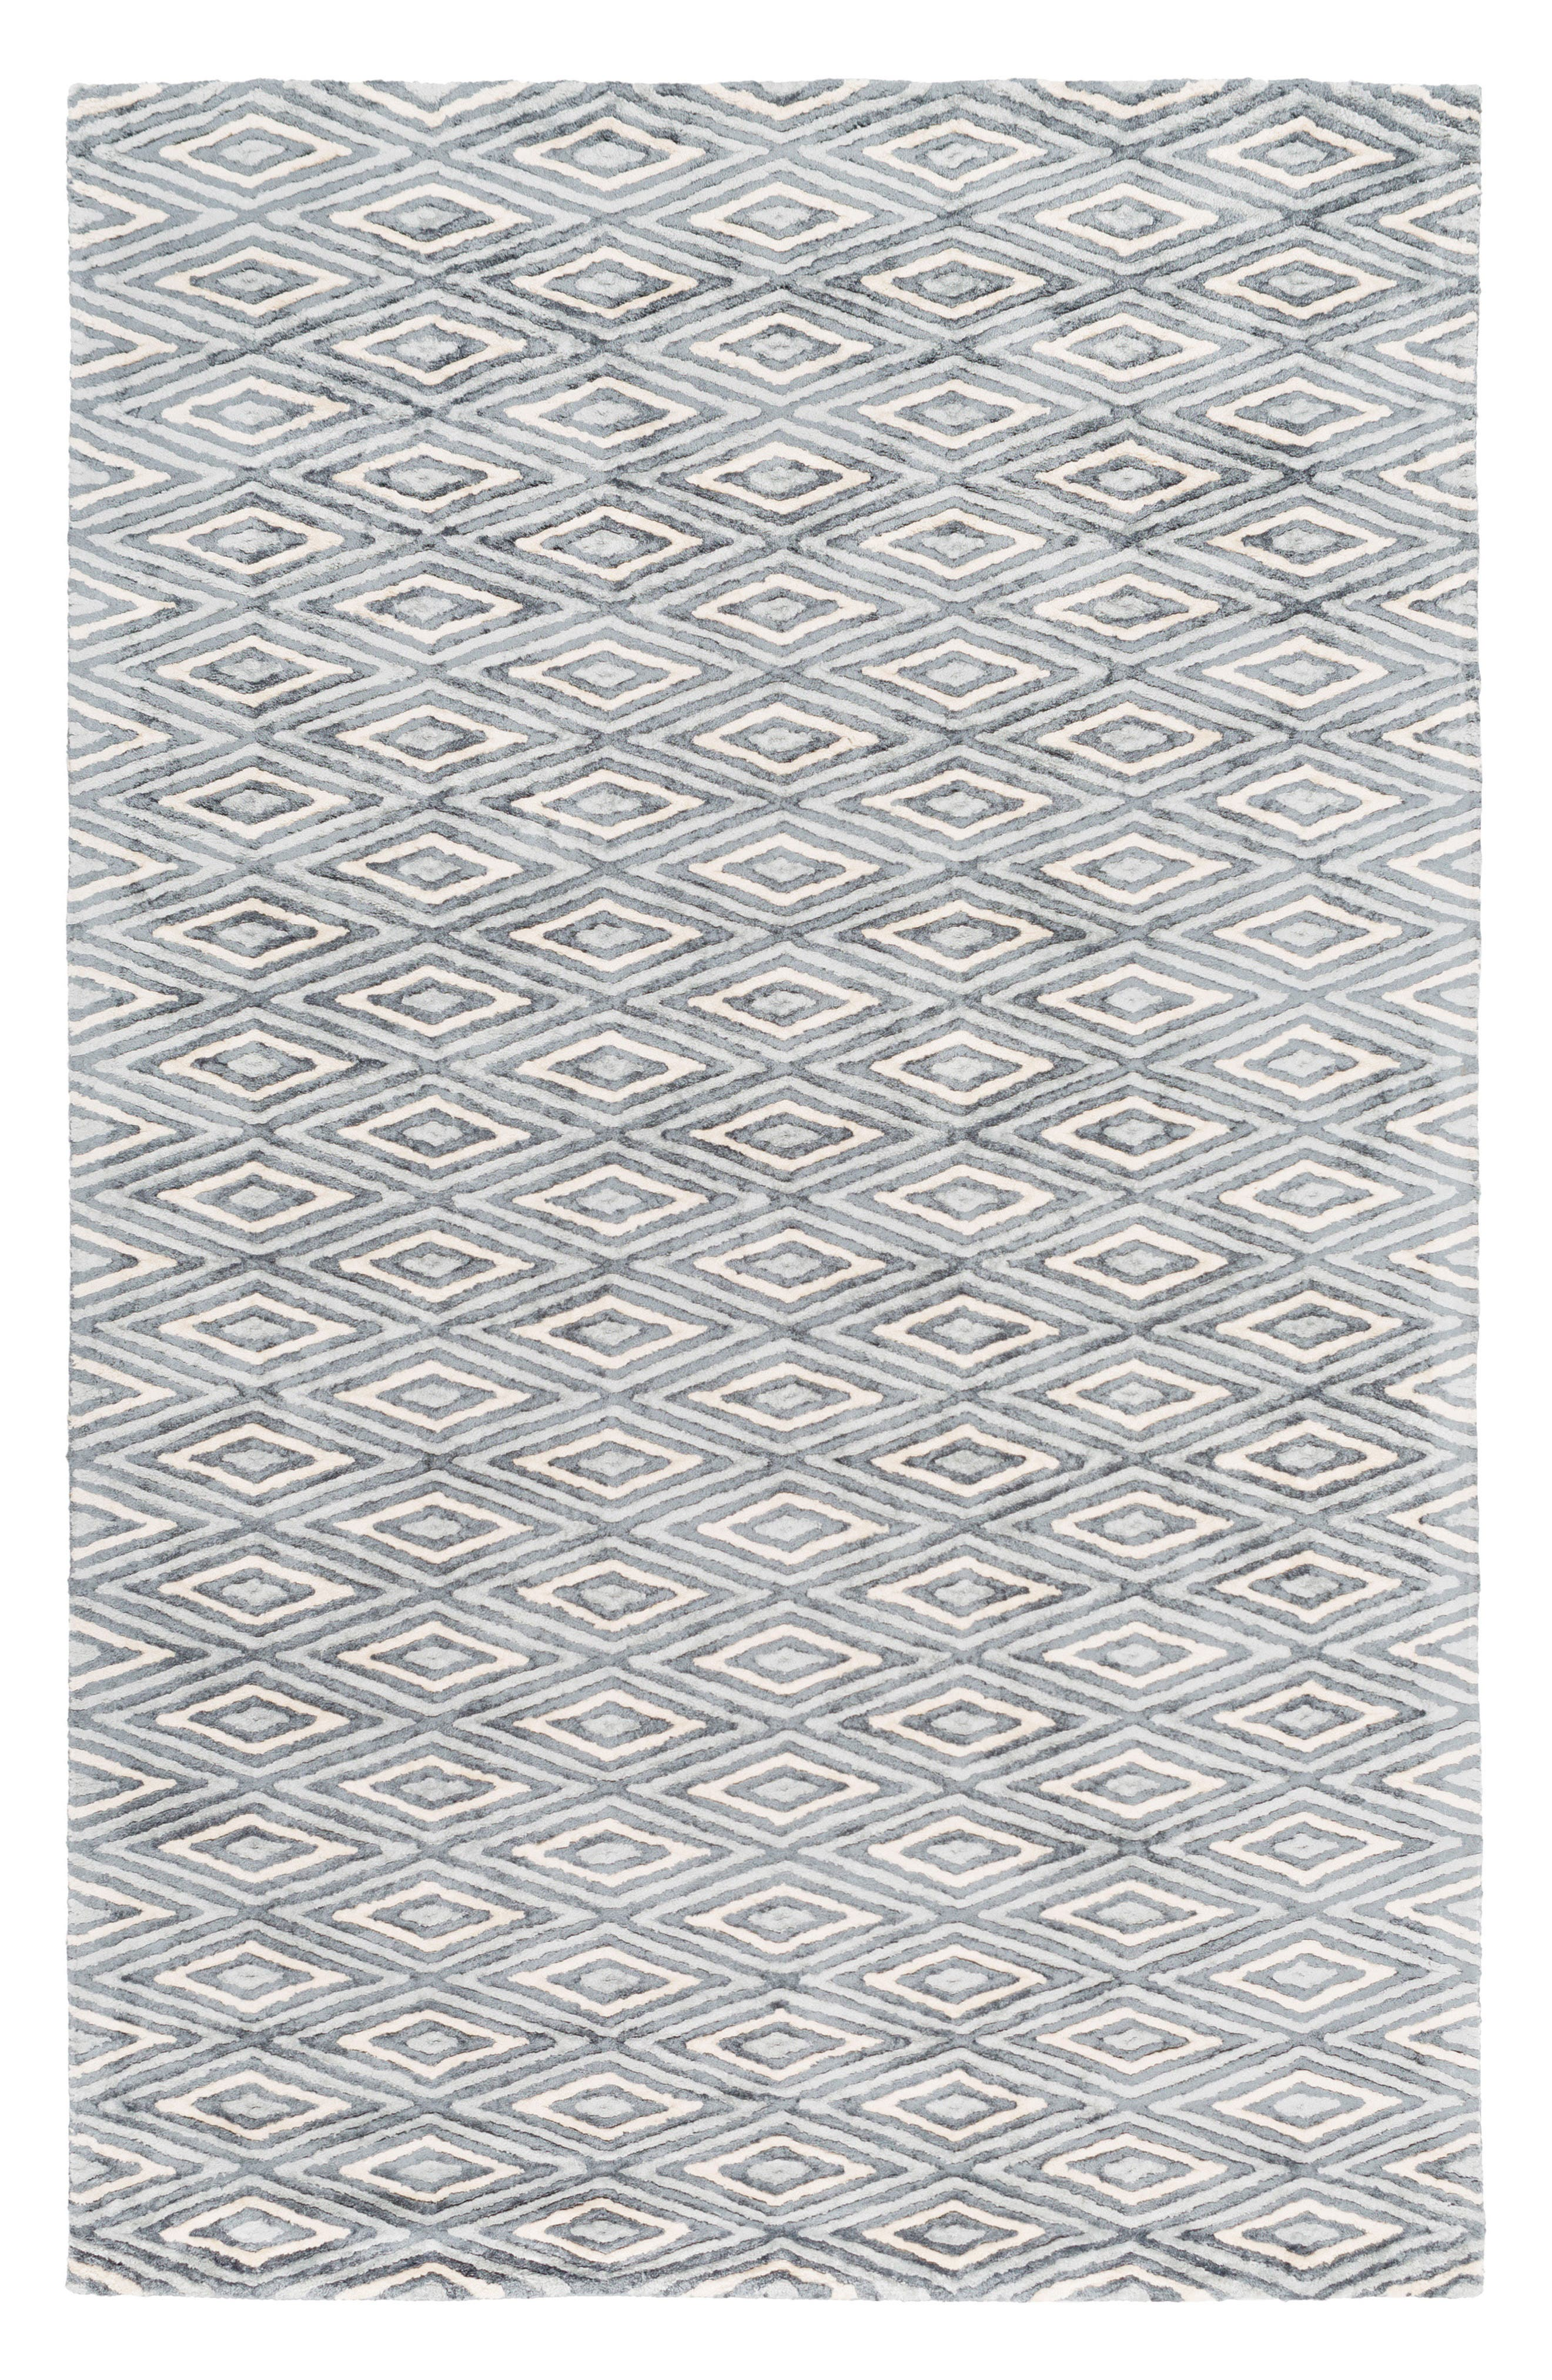 Zira Rug,                             Main thumbnail 1, color,                             Grey